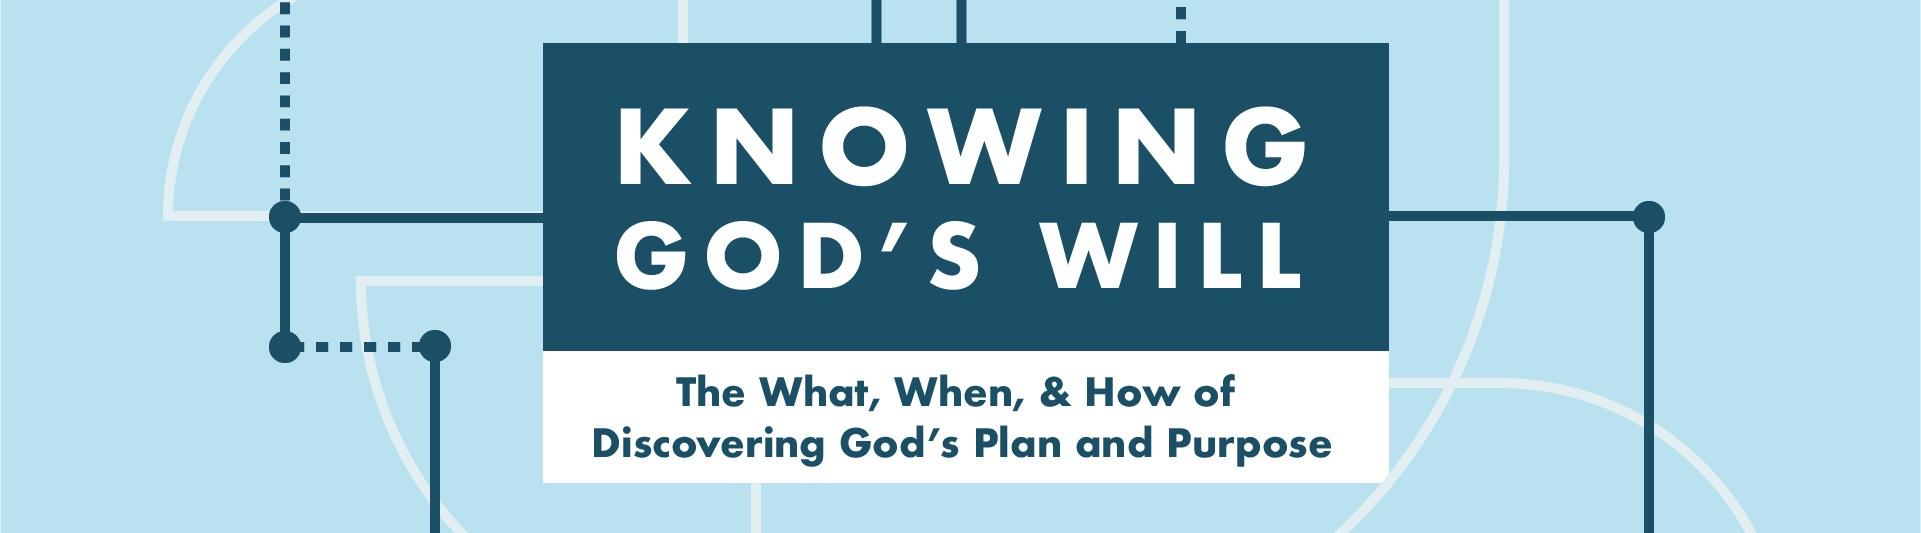 knowing-gods-will.jpg